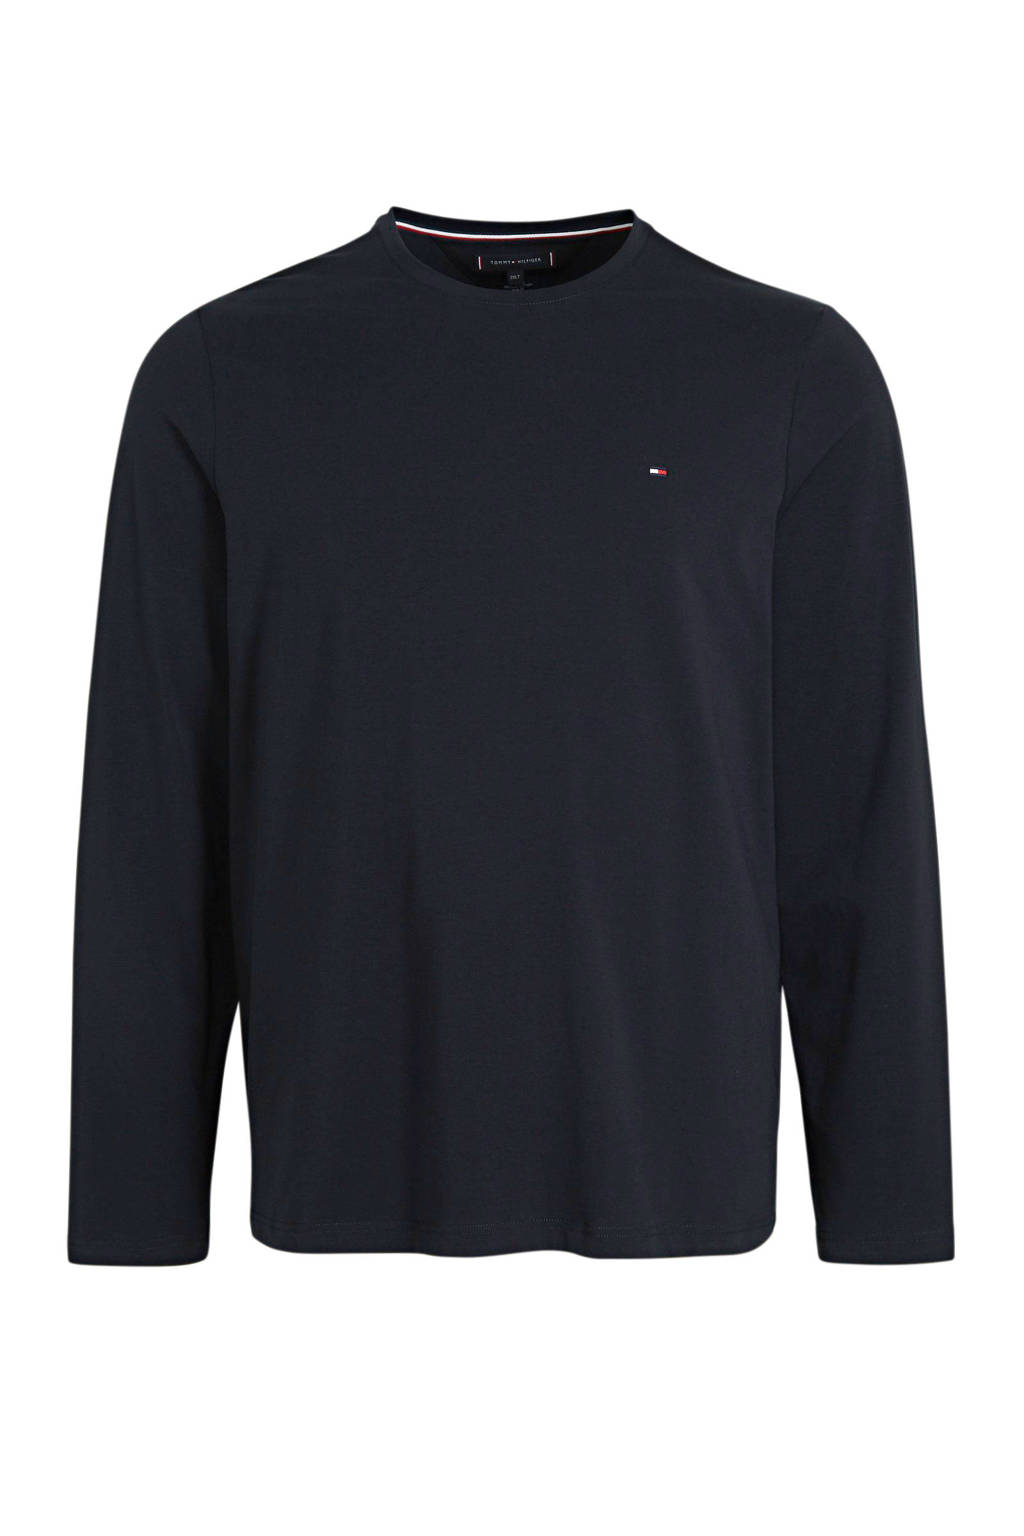 Tommy Hilfiger Big & Tall +size T-shirt met biologisch katoen donkerblauw, Donkerblauw